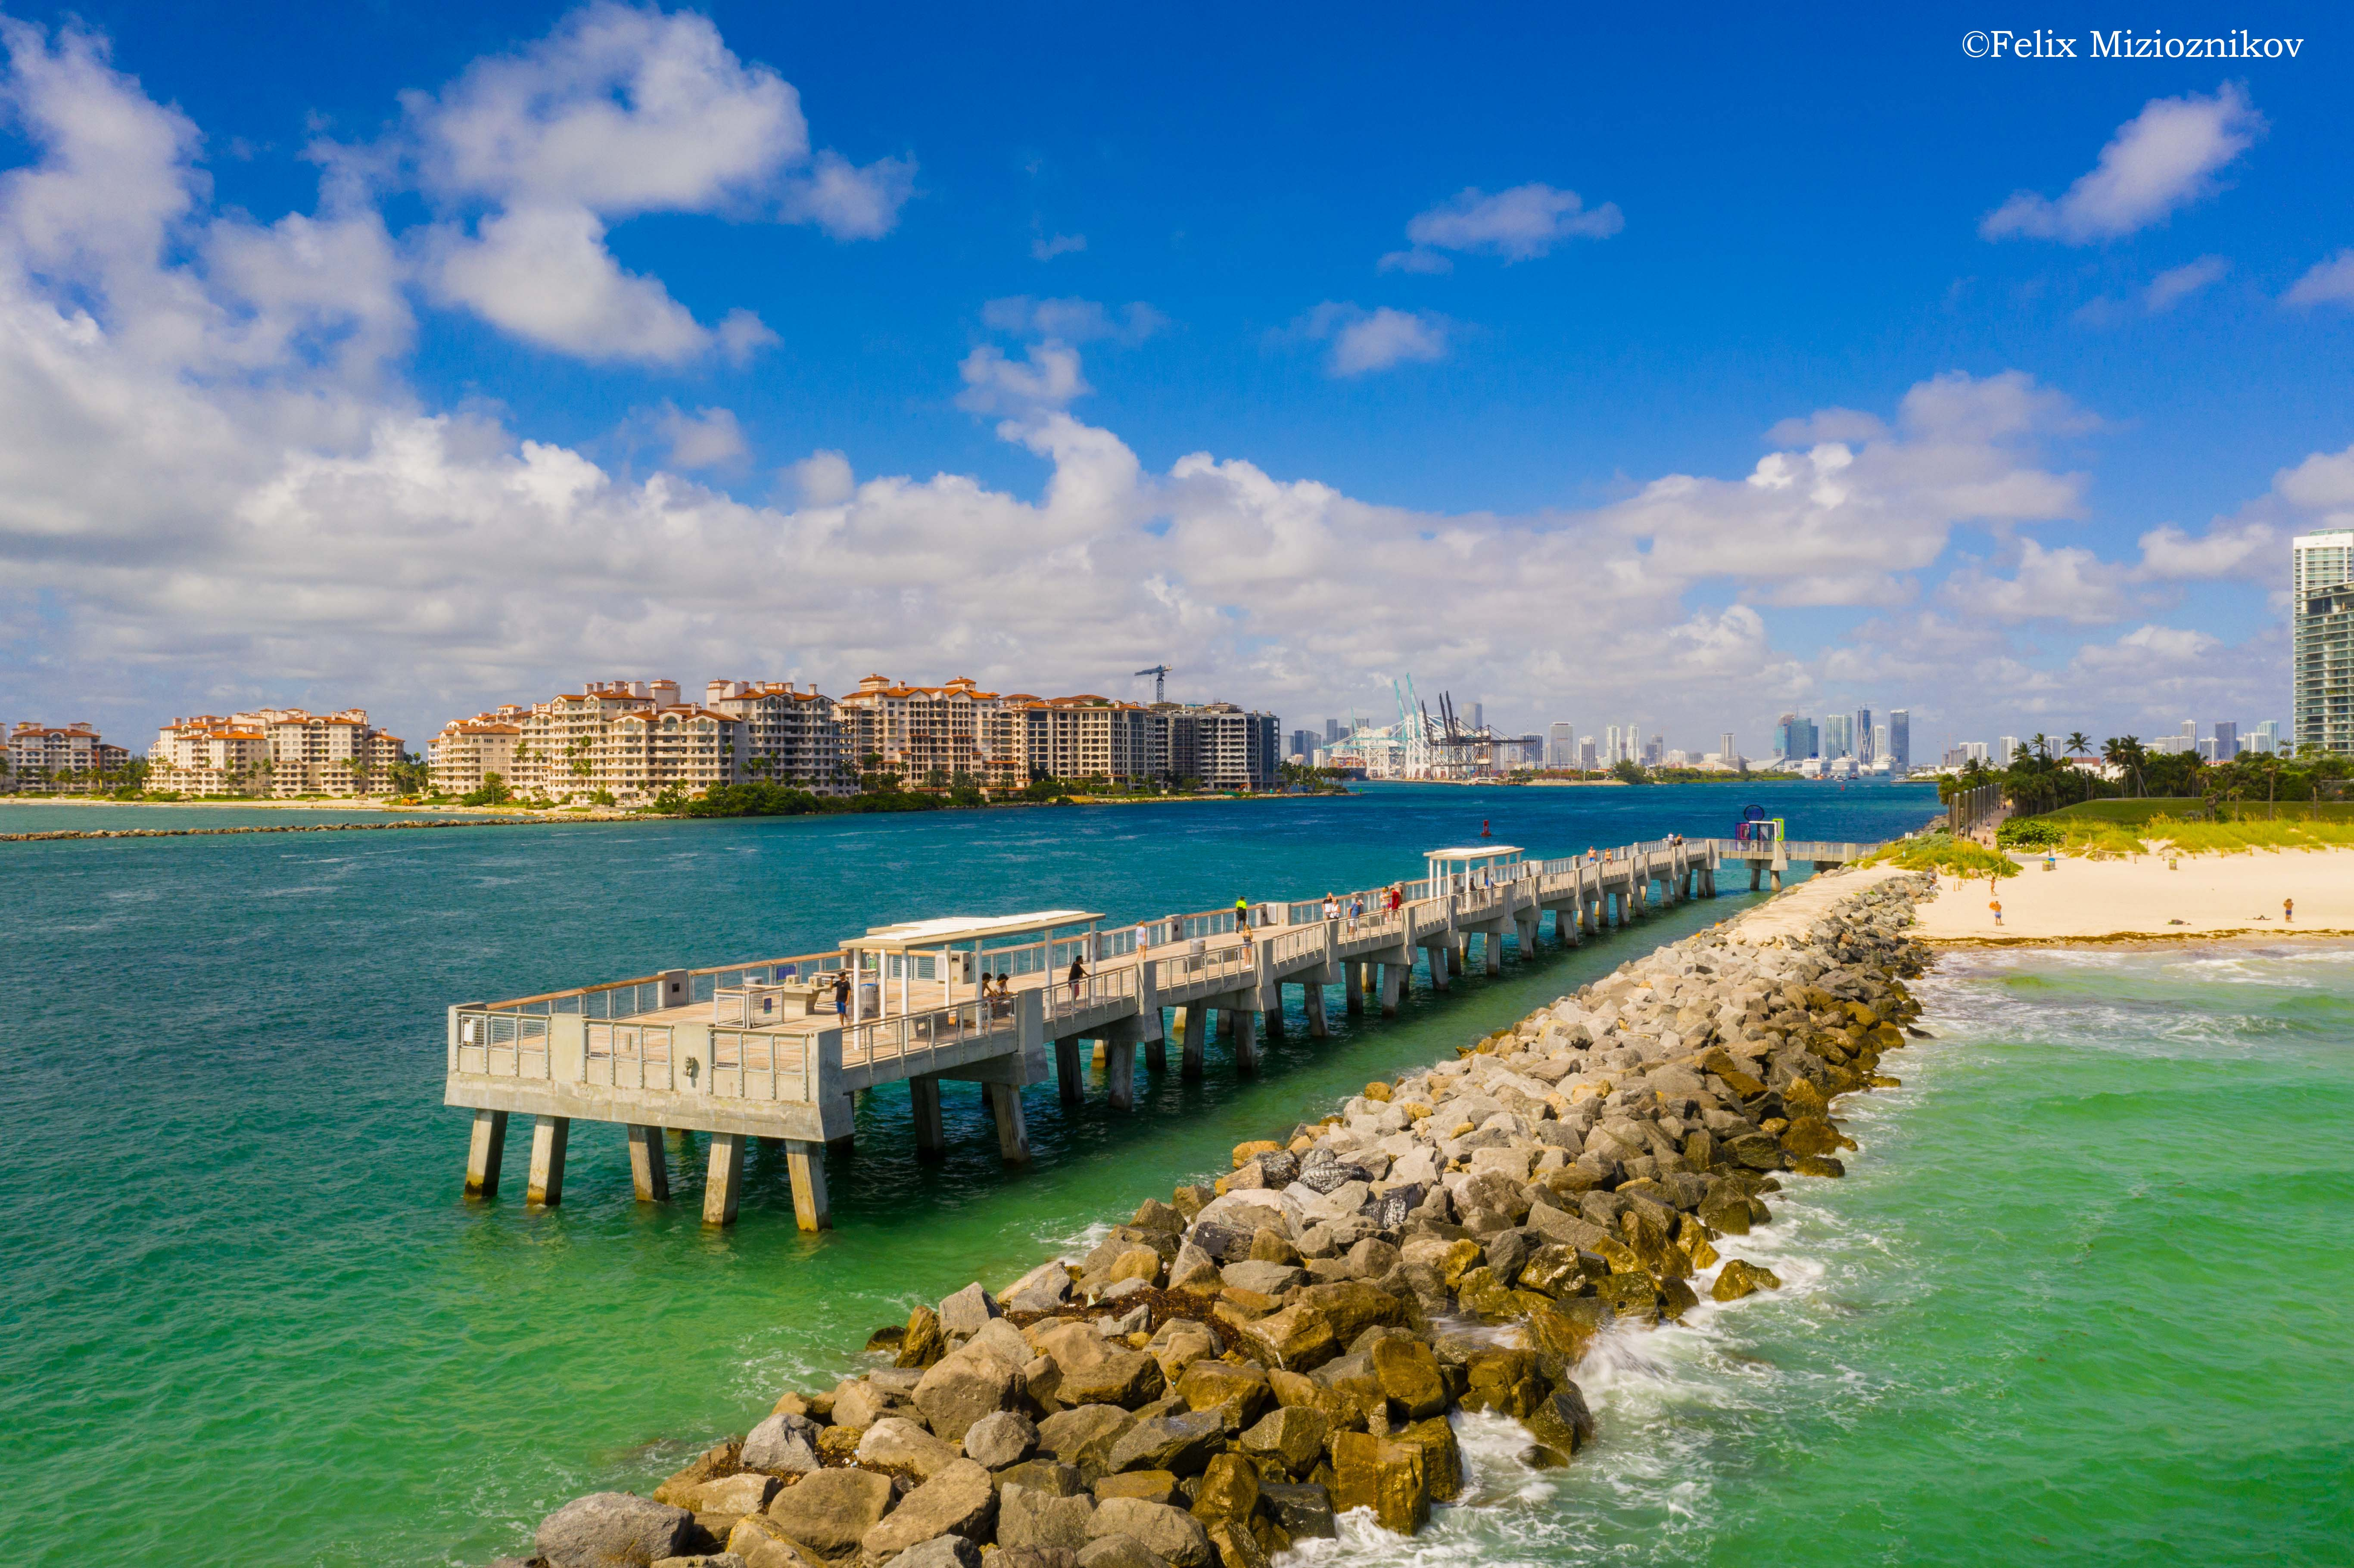 Miami Beach Pier